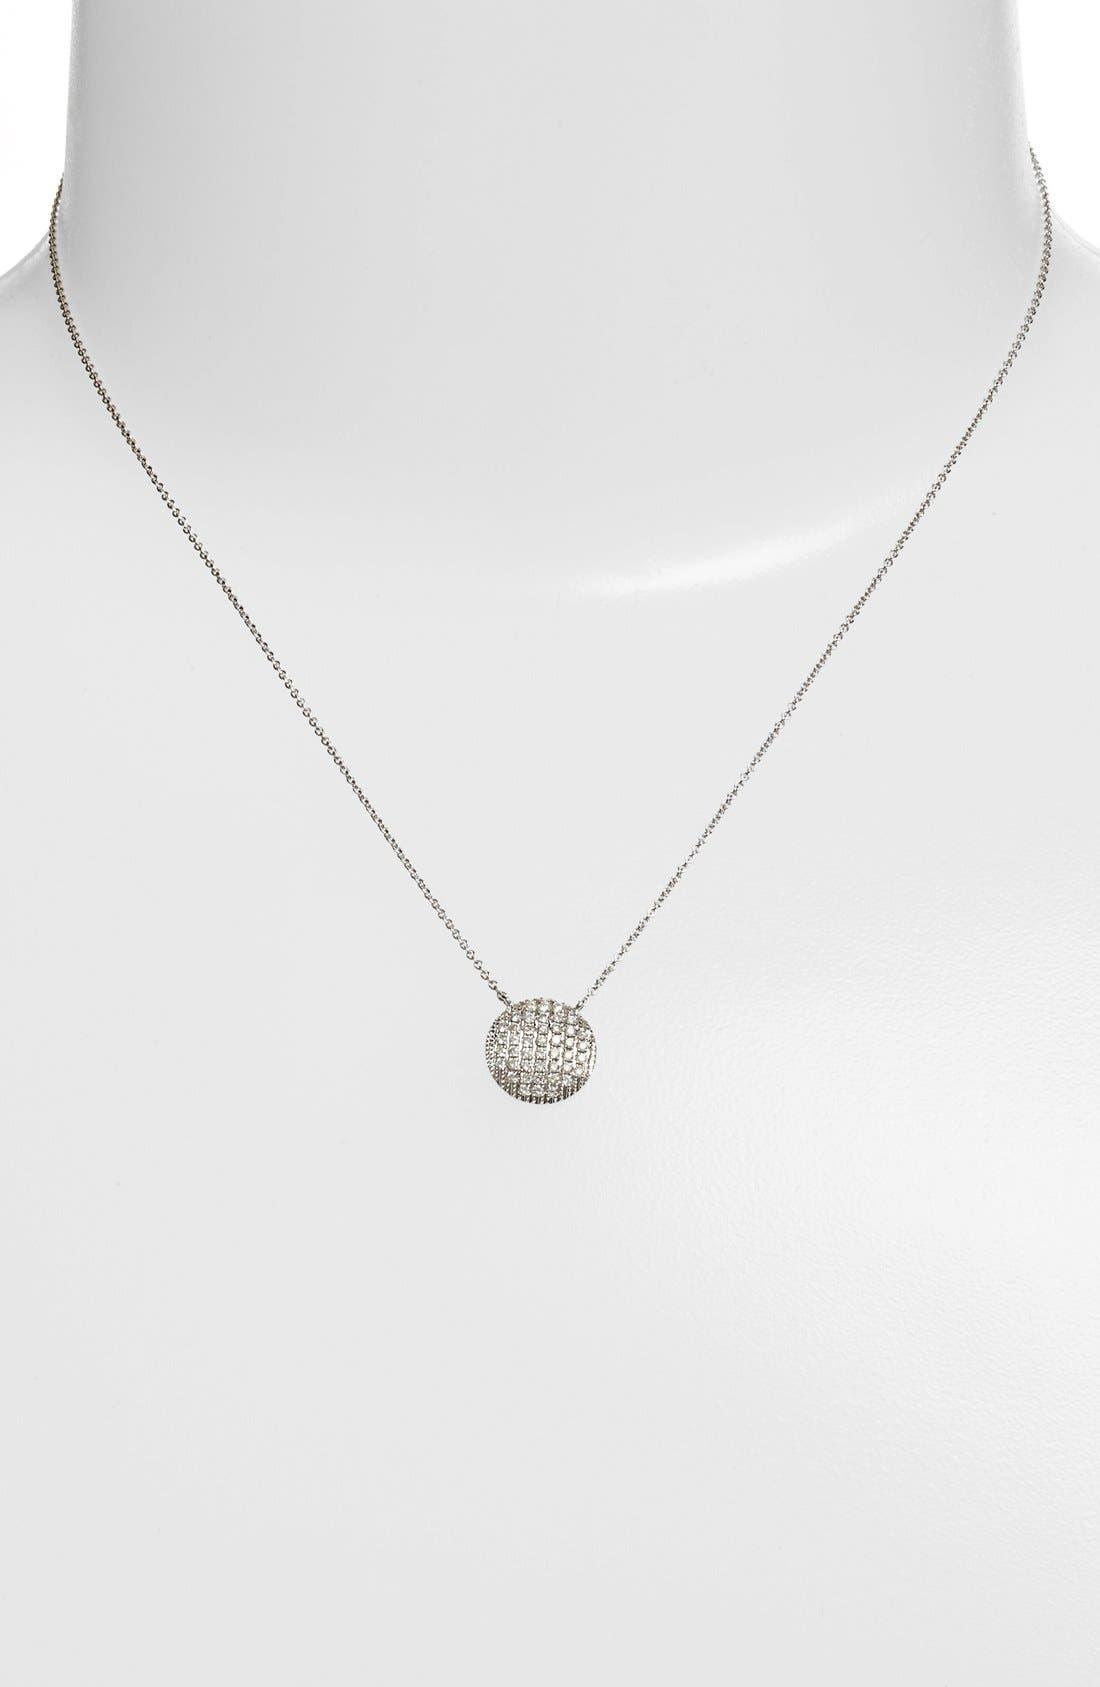 DANA REBECCA DESIGNS, 'Lauren Joy' Diamond Disc Pendant Necklace, Alternate thumbnail 2, color, WHITE GOLD